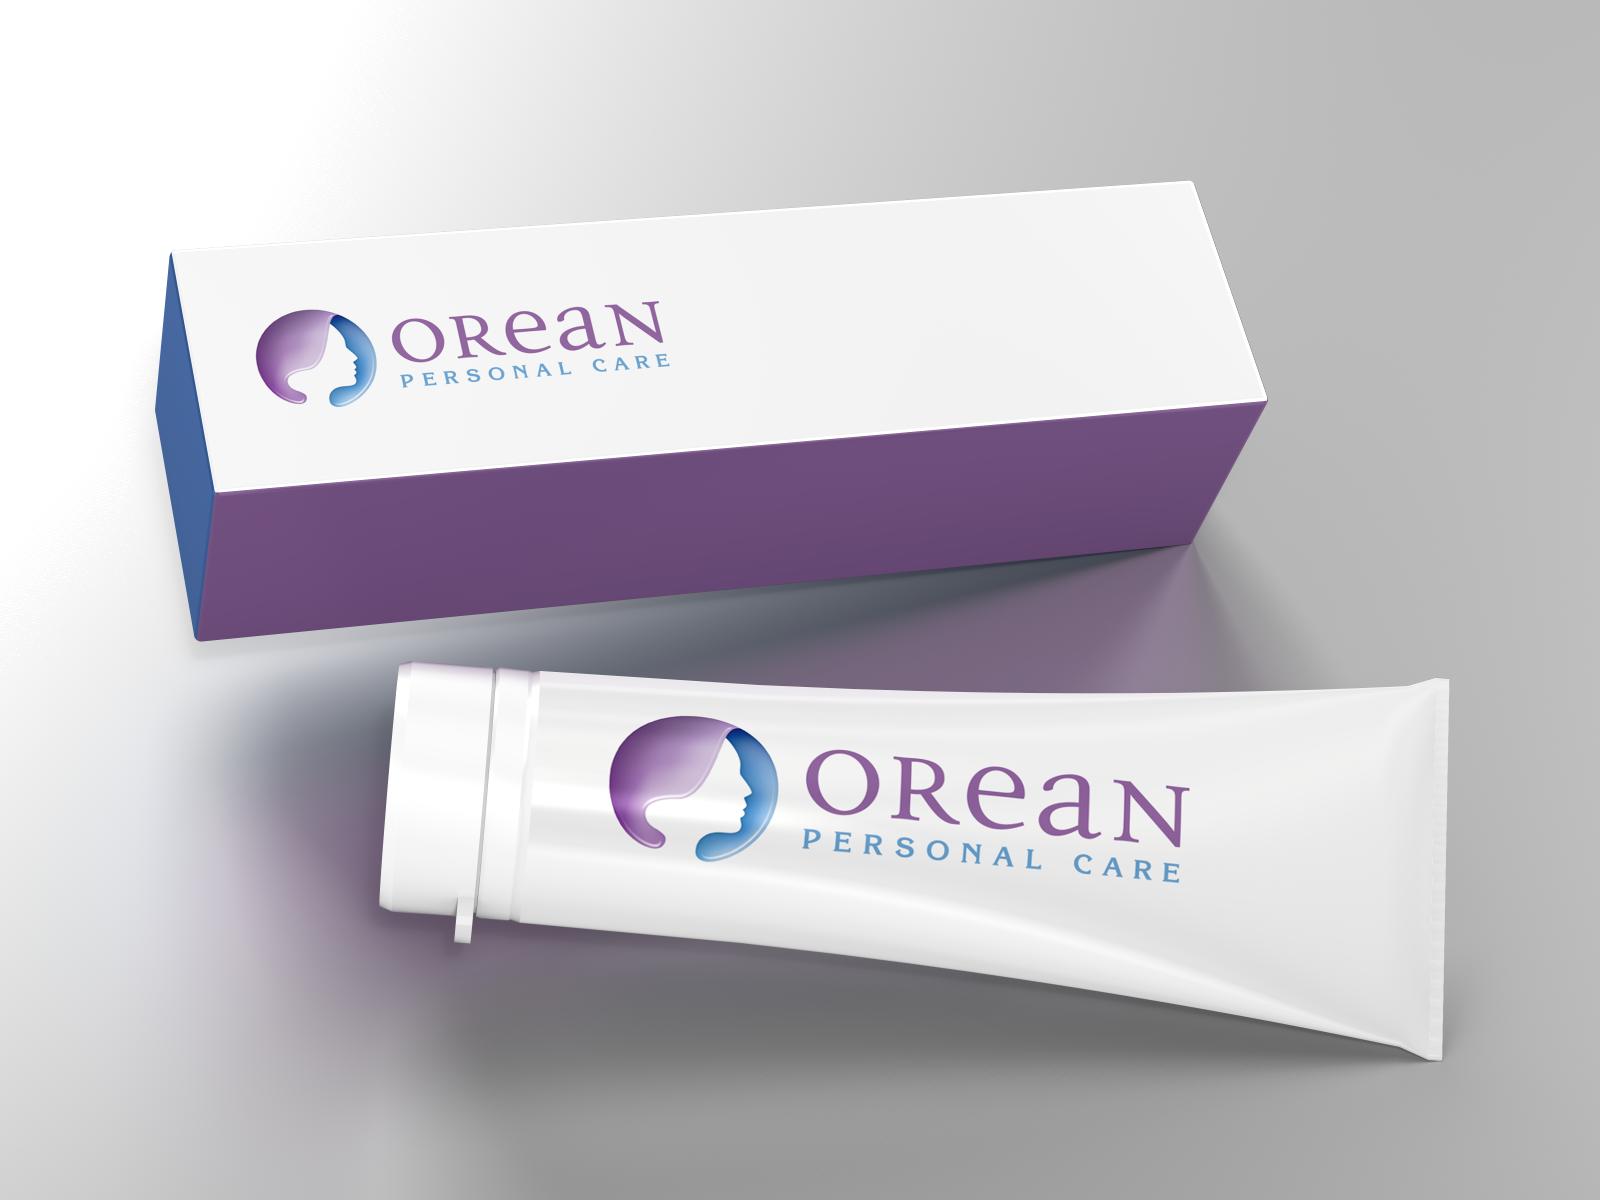 Orean Packaging Mockup